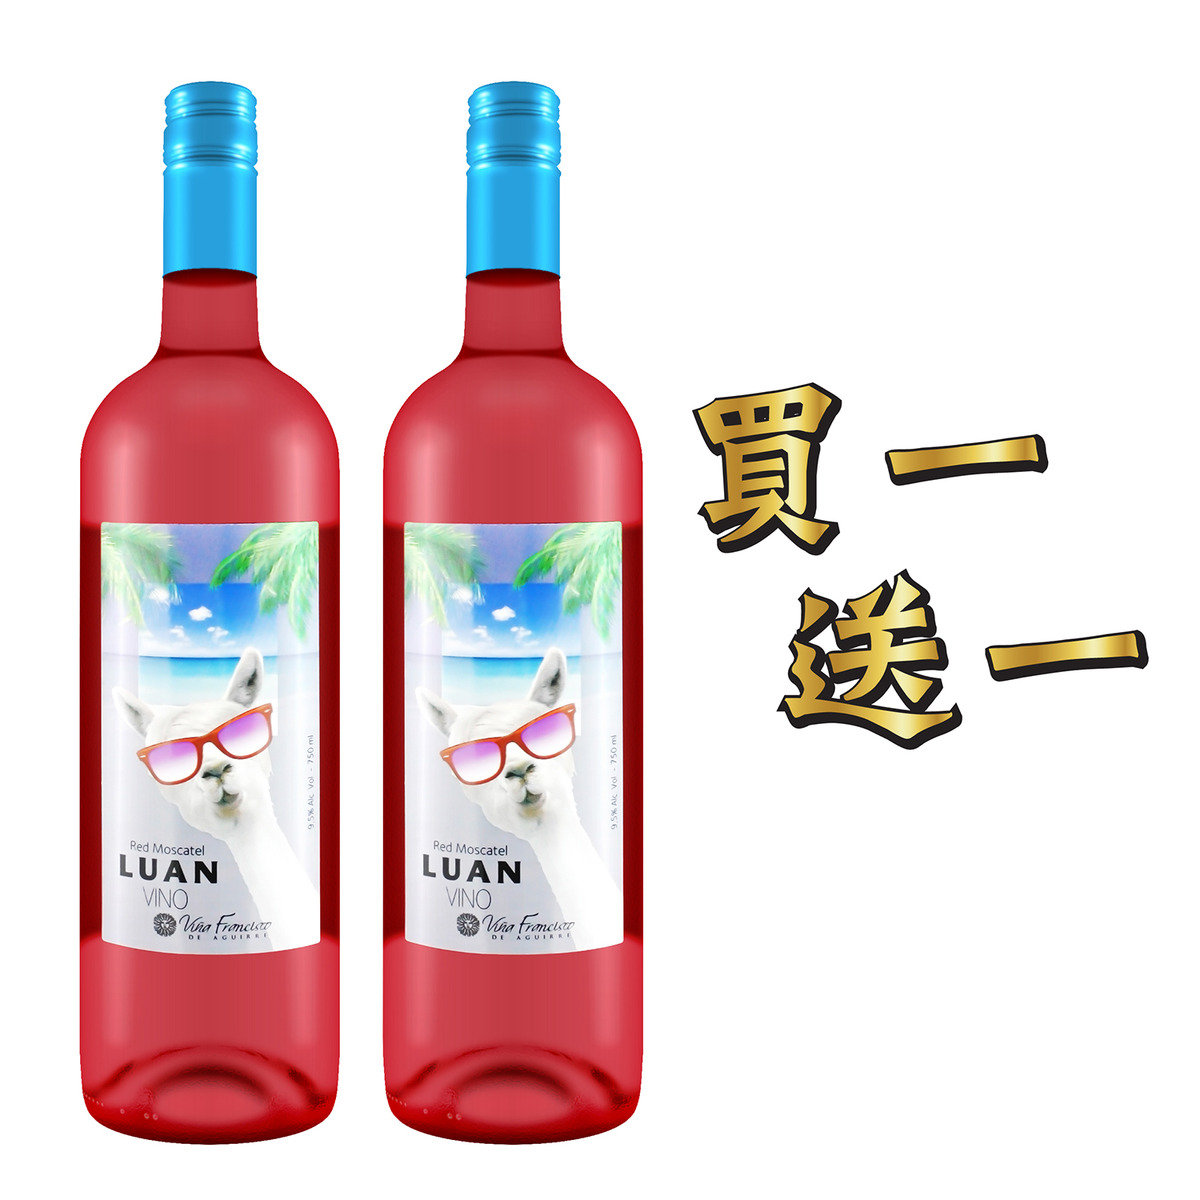 [買1送1!] Luan Wine Red Moscatel 12' 750ml